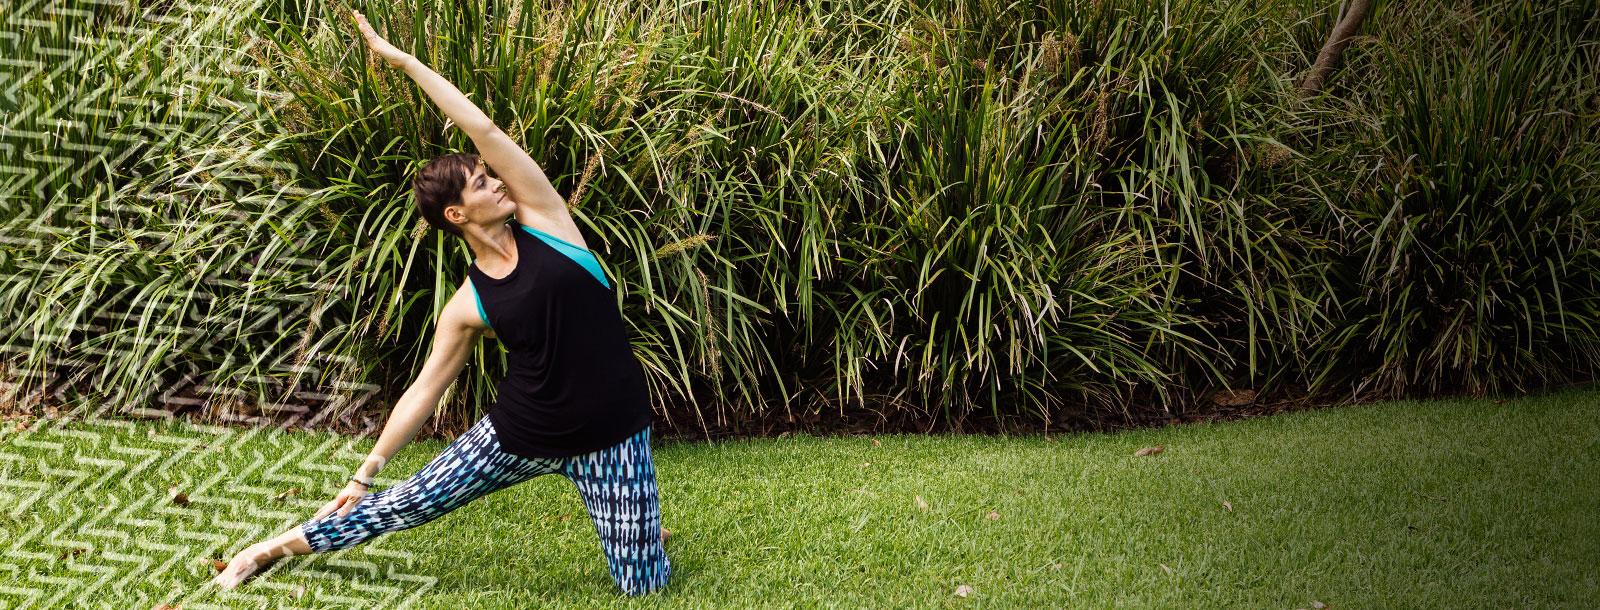 yoga pose; mobile yoga teacher; asana; gate pose; parighasana